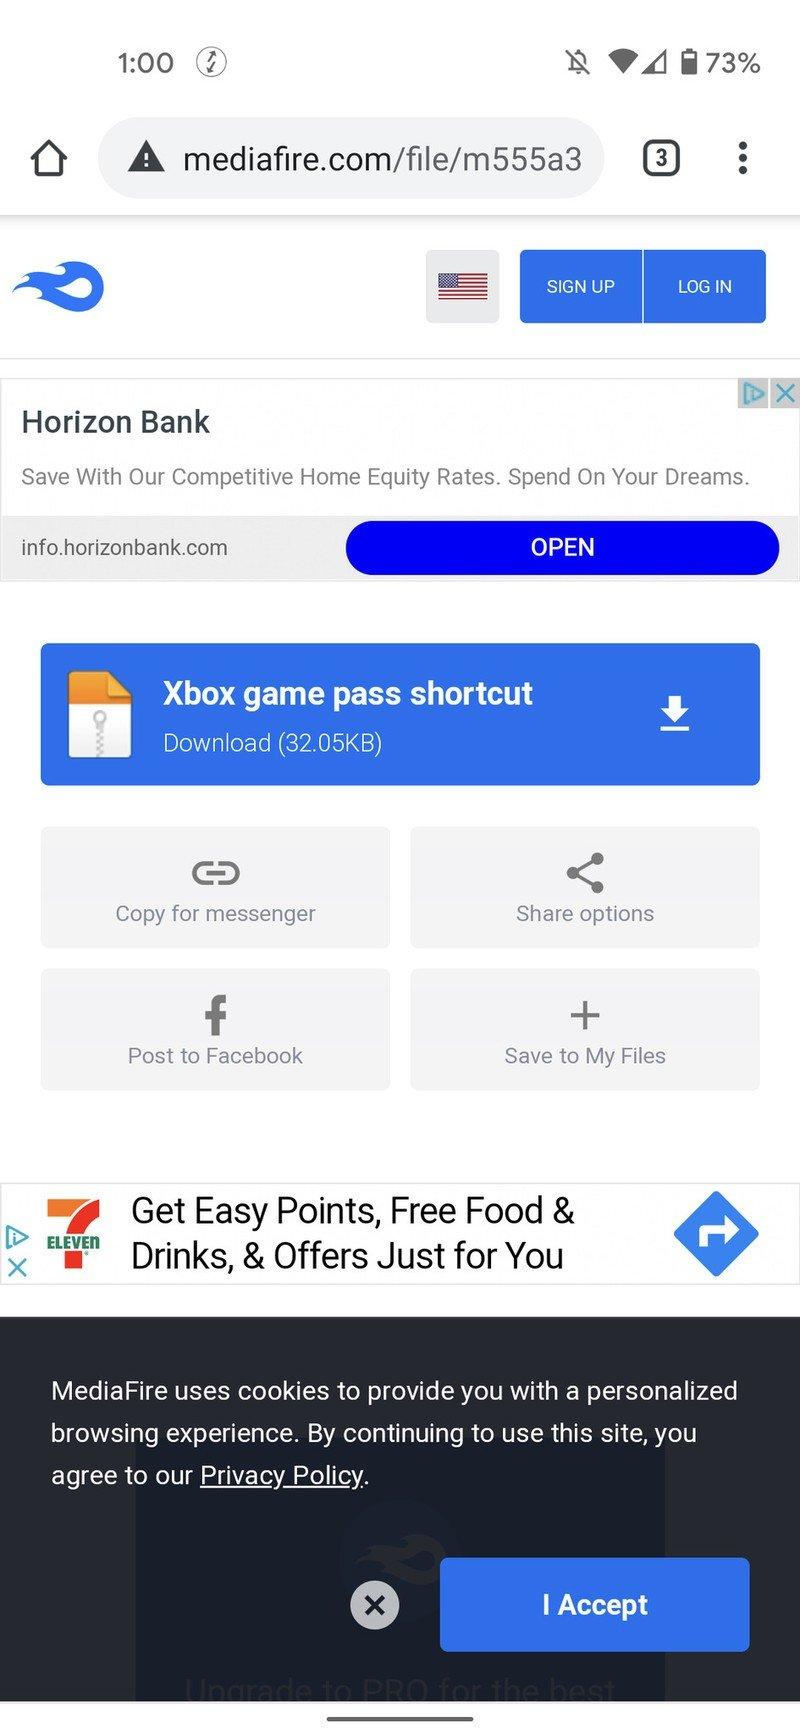 xbox-game-pass-android-tv-phone-7.jpg